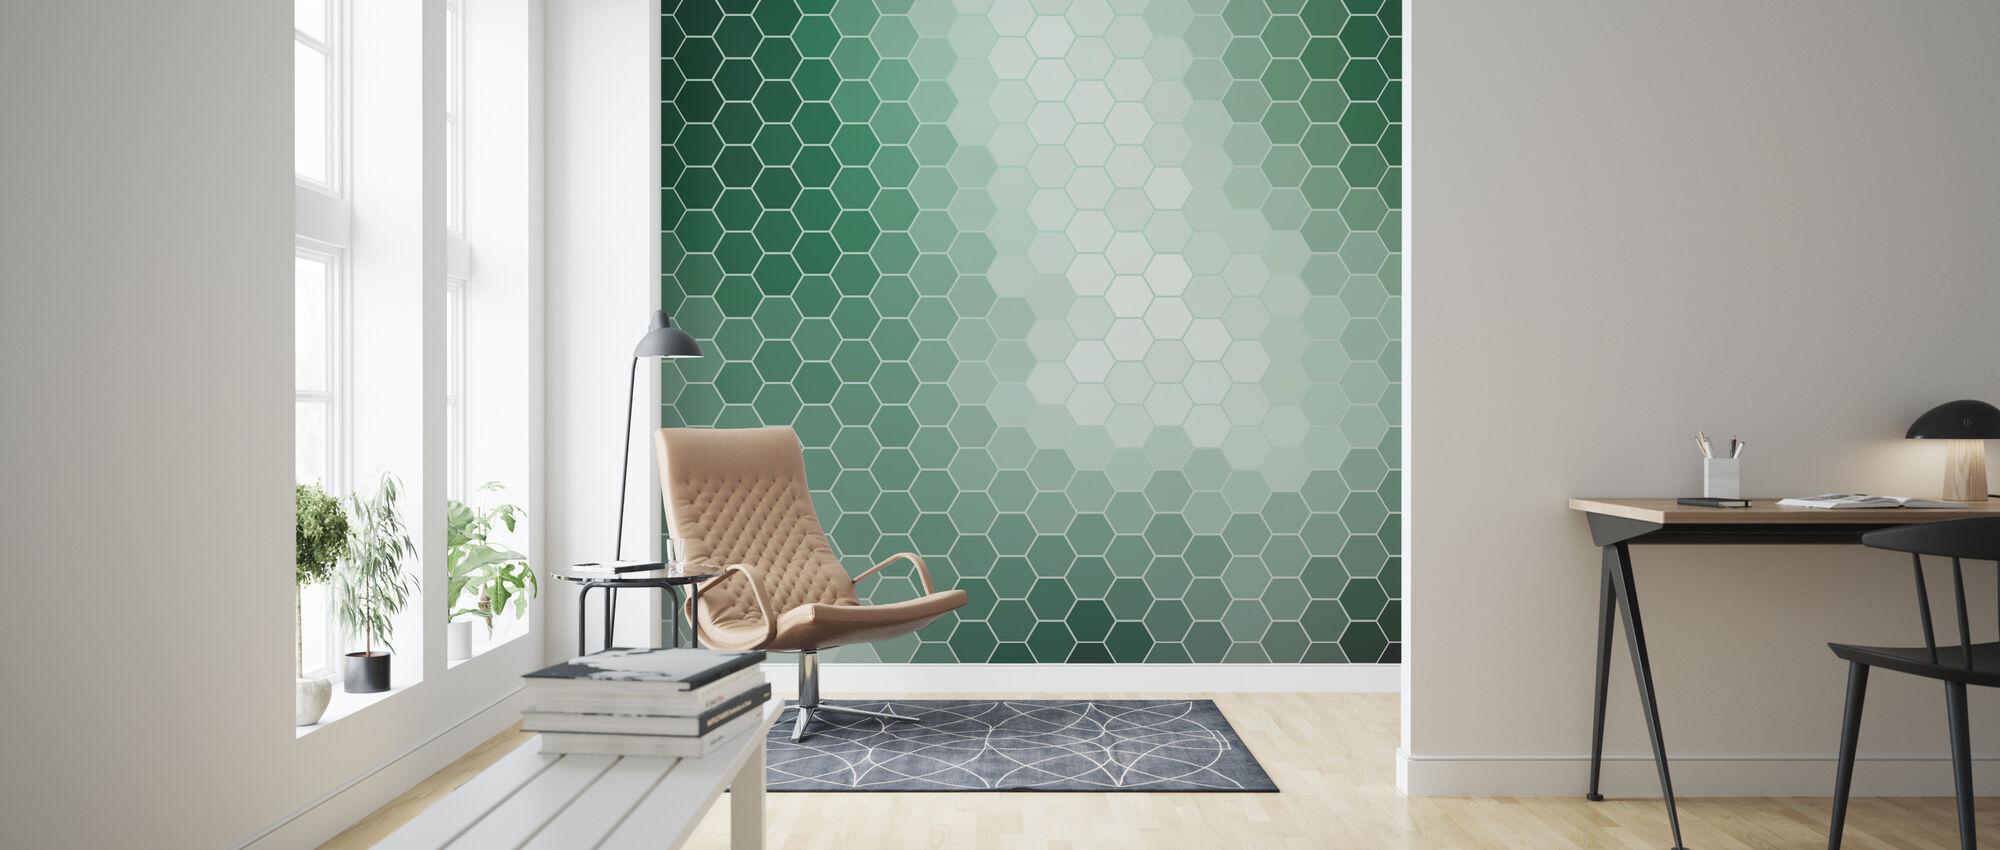 Emerald Green Hexagons - Wallpaper - Living Room